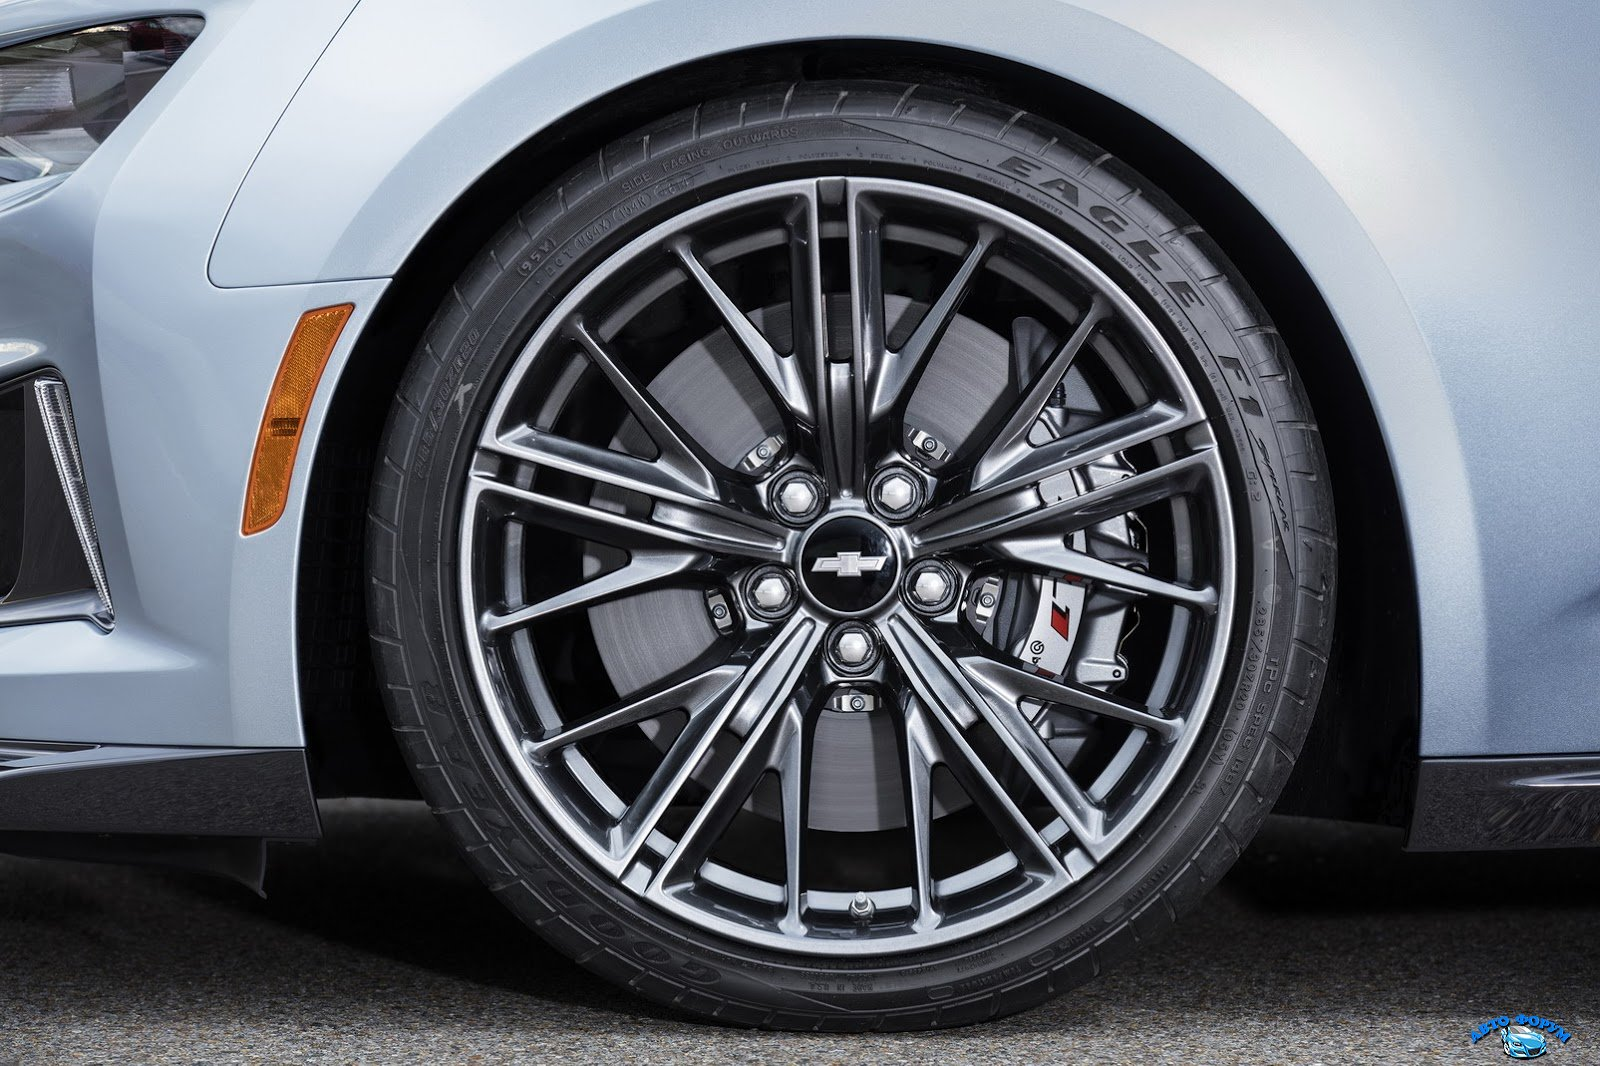 2017-Chevrolet-Camaro-ZL1-10.jpg